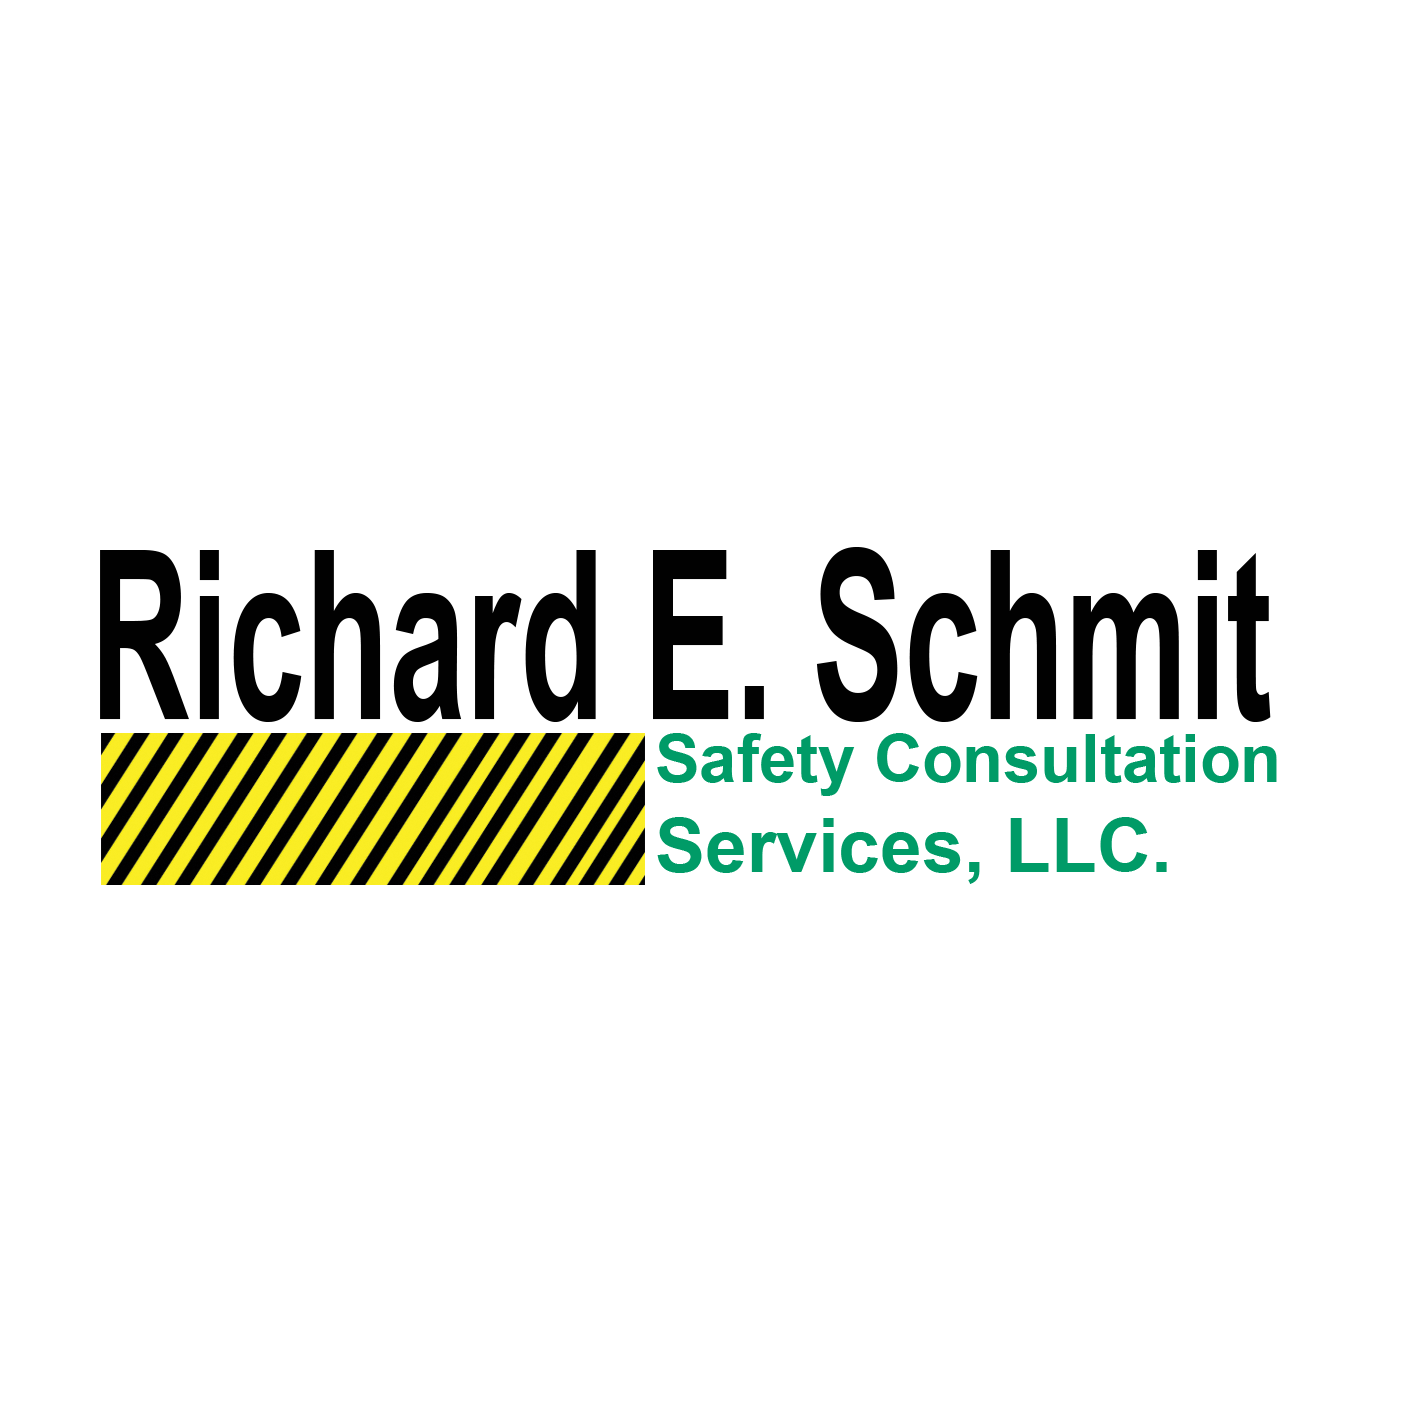 Richard E. Schmit Safety Consultation Services, Llc